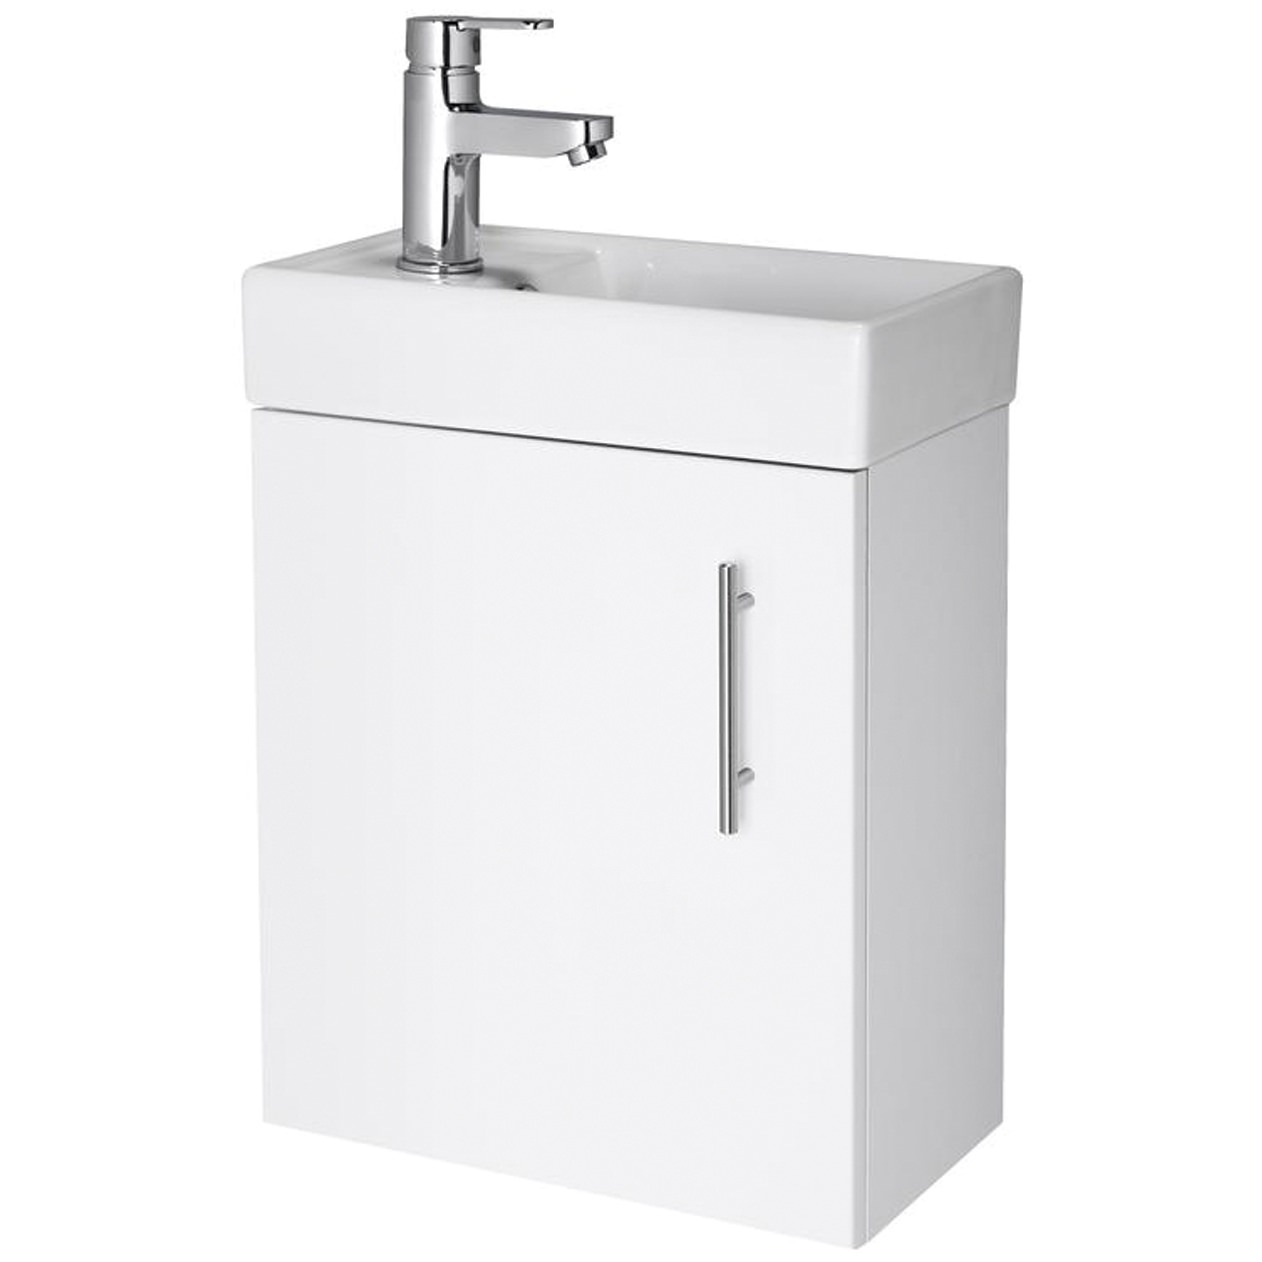 Minimalist Bathroom Wall Decor: Lauren Minimalist 400mm White Wall Hung Cabinet And Basin